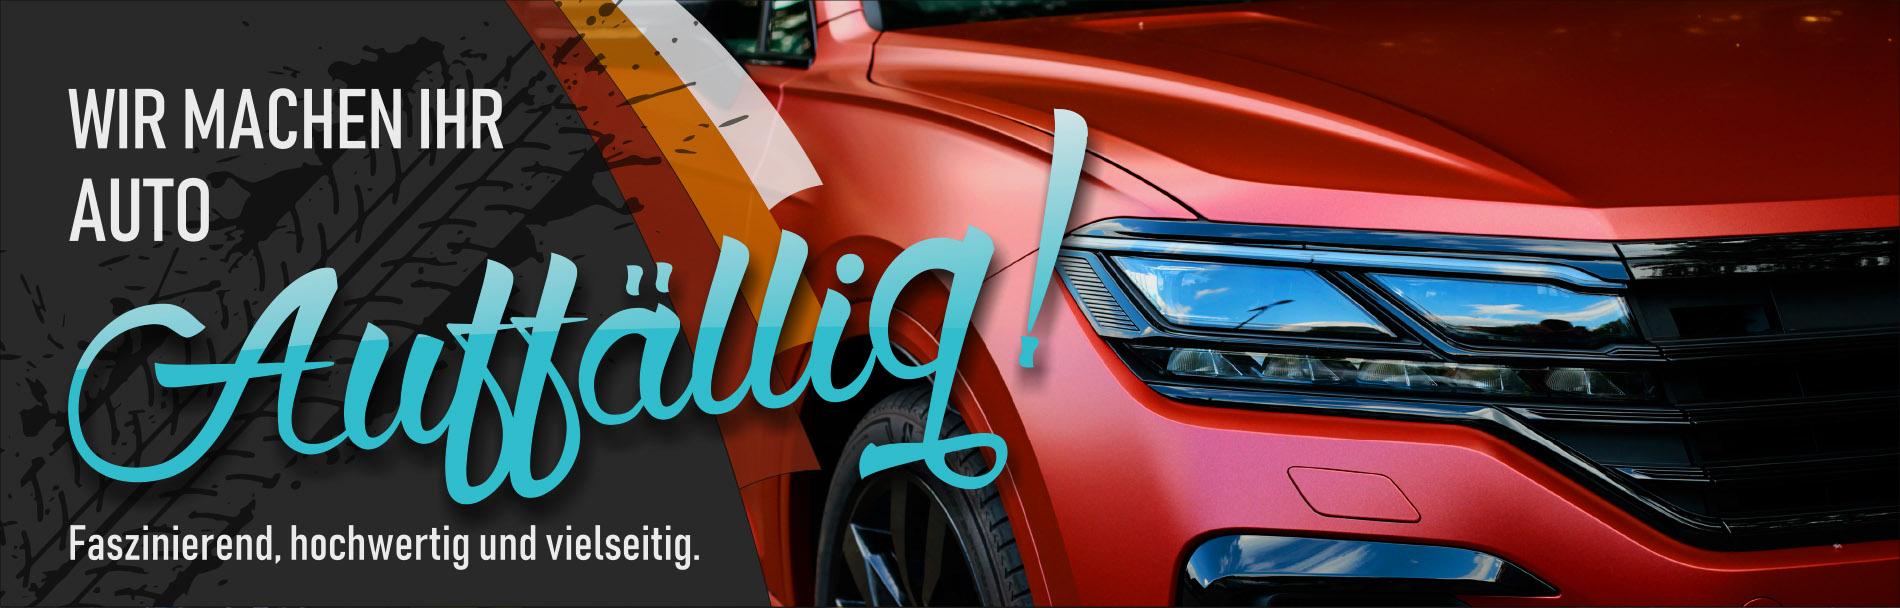 Premium Car Wrap, folie fürs auto, matt folie, folierung preise, teilfolierung, folienbeschichtung, fahrzeugvollverklebung, autovollfolierung, fahrzeug vollfolierung, auto vollverklebung, teilverklebung, kfz folierung, autofolierung,